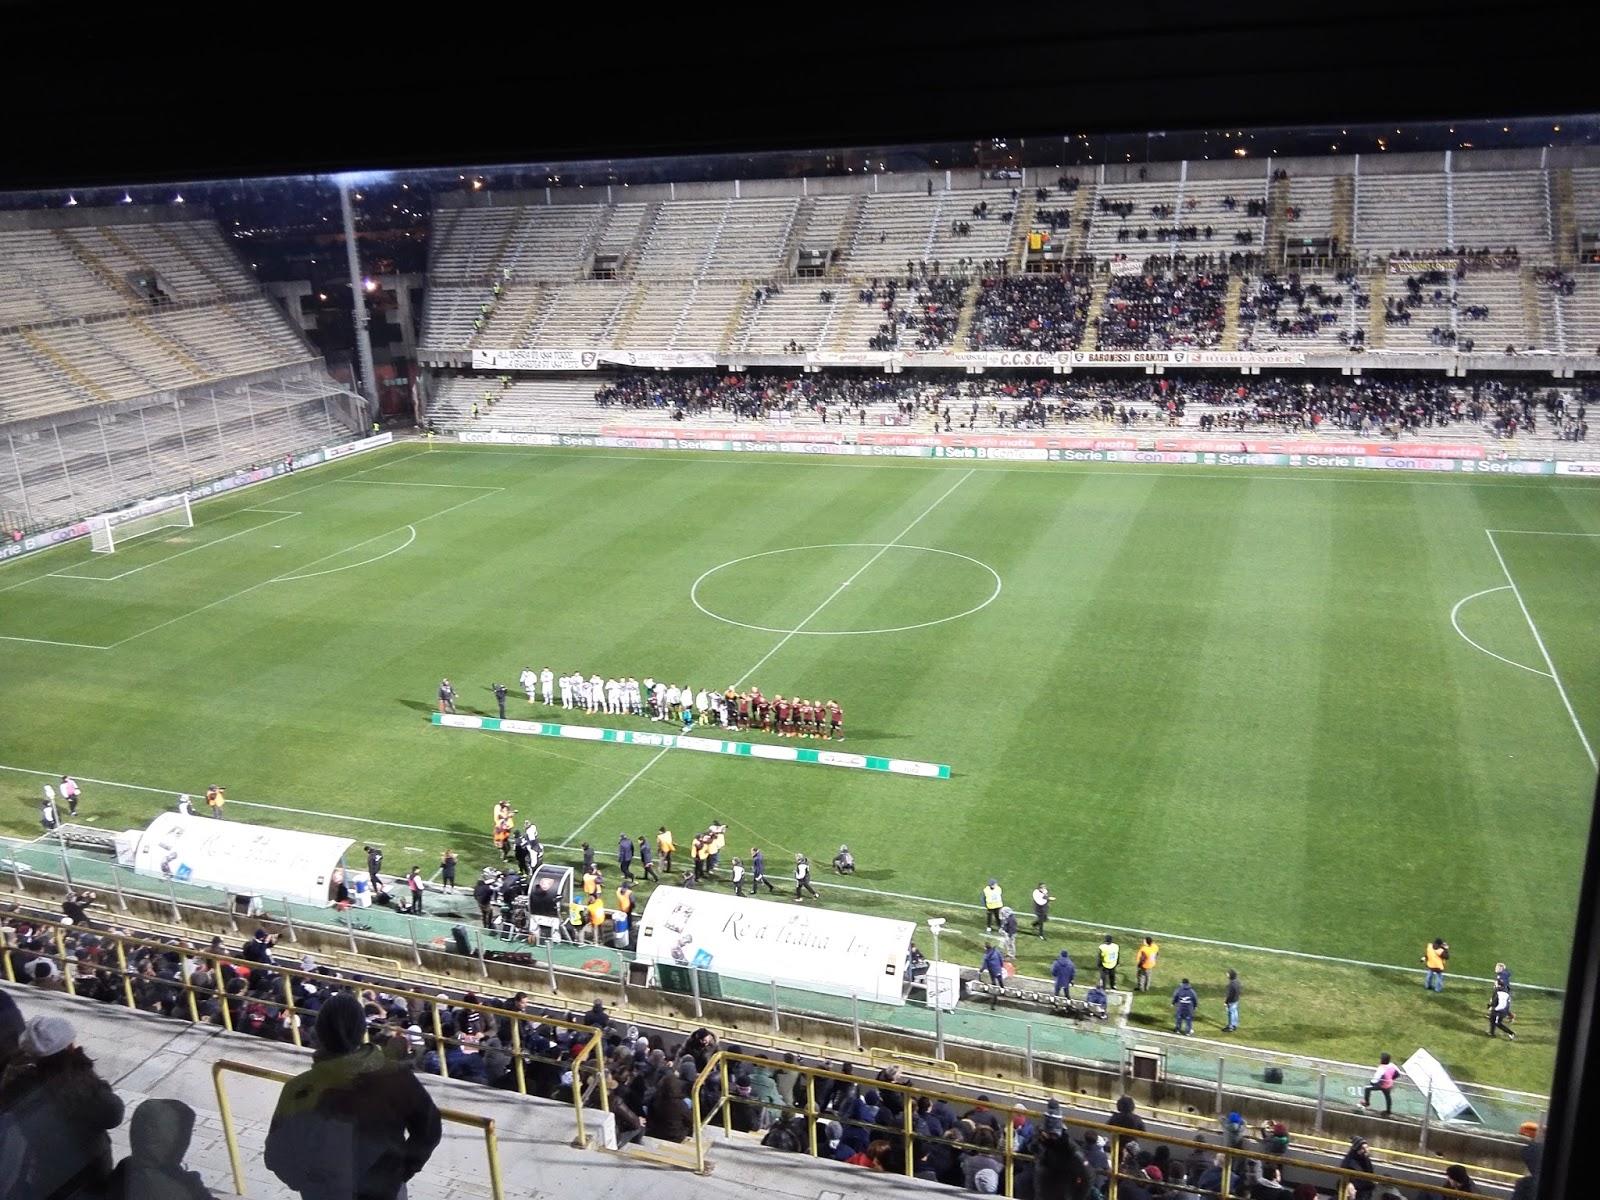 ce862f9a3088 22nd January 2016 Salernitana 3 Brescia 0 Serie B 9